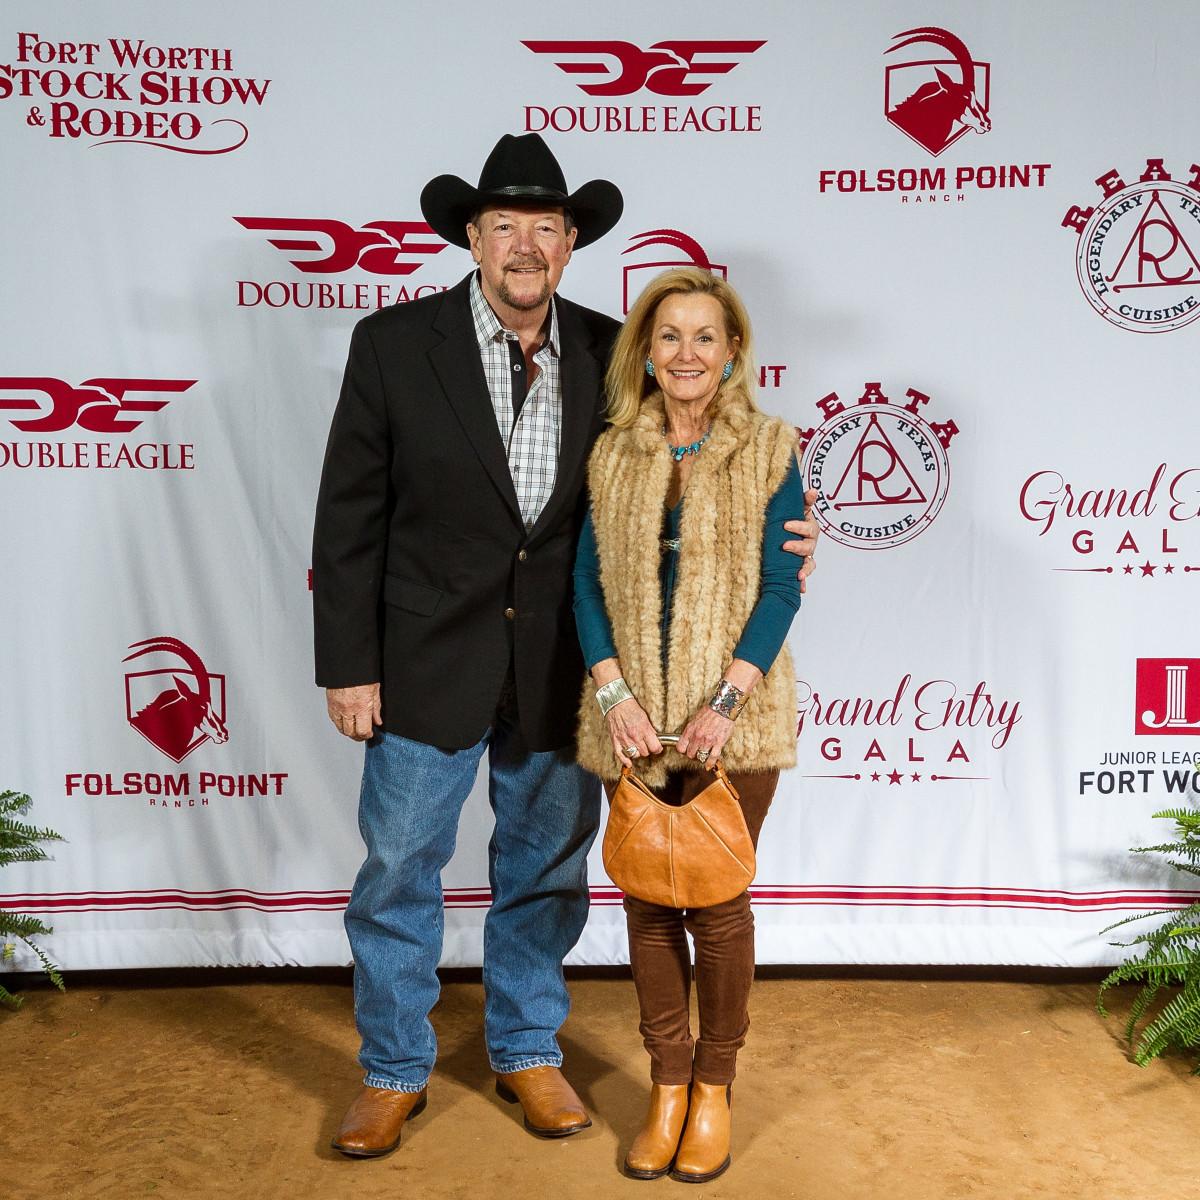 Fort Worth Stock Show Grand Entry Gala Bill Landreth, Gail Landreth